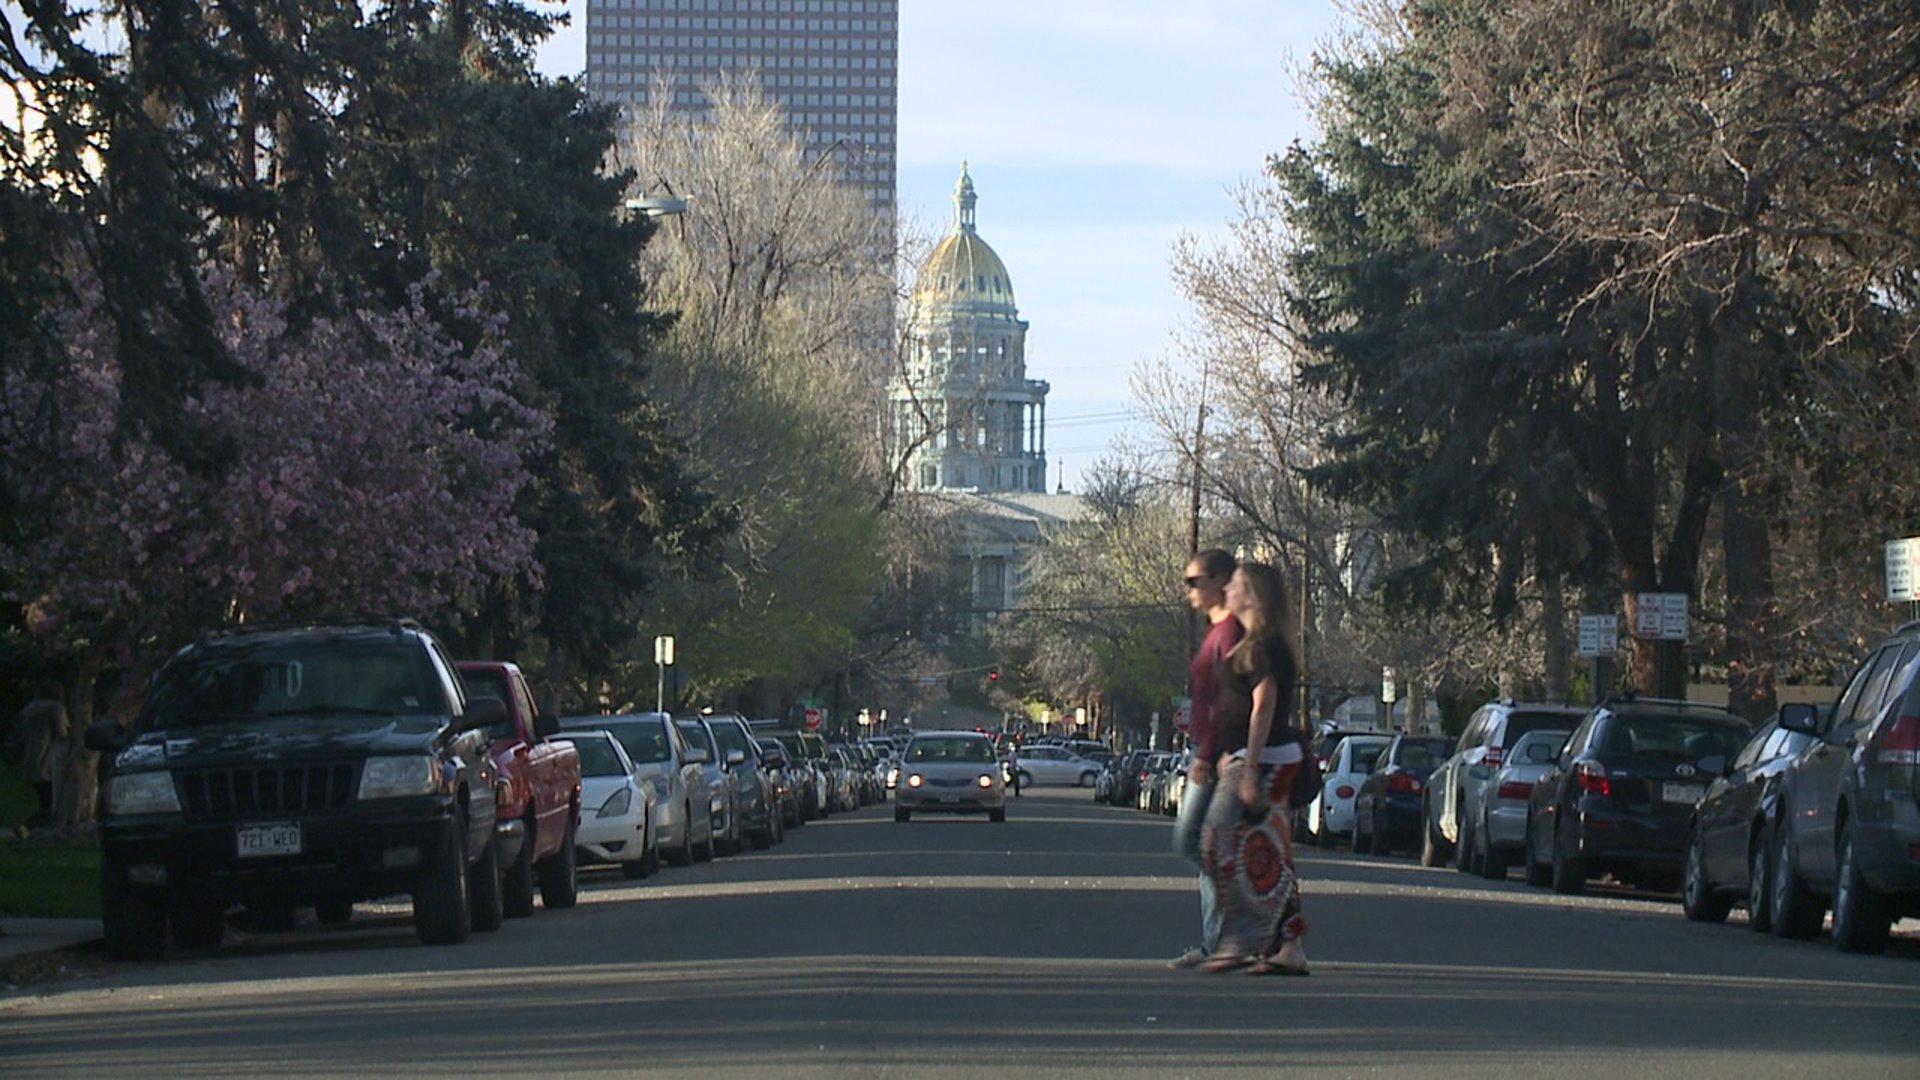 Capitol Hill neighborhood in Denver